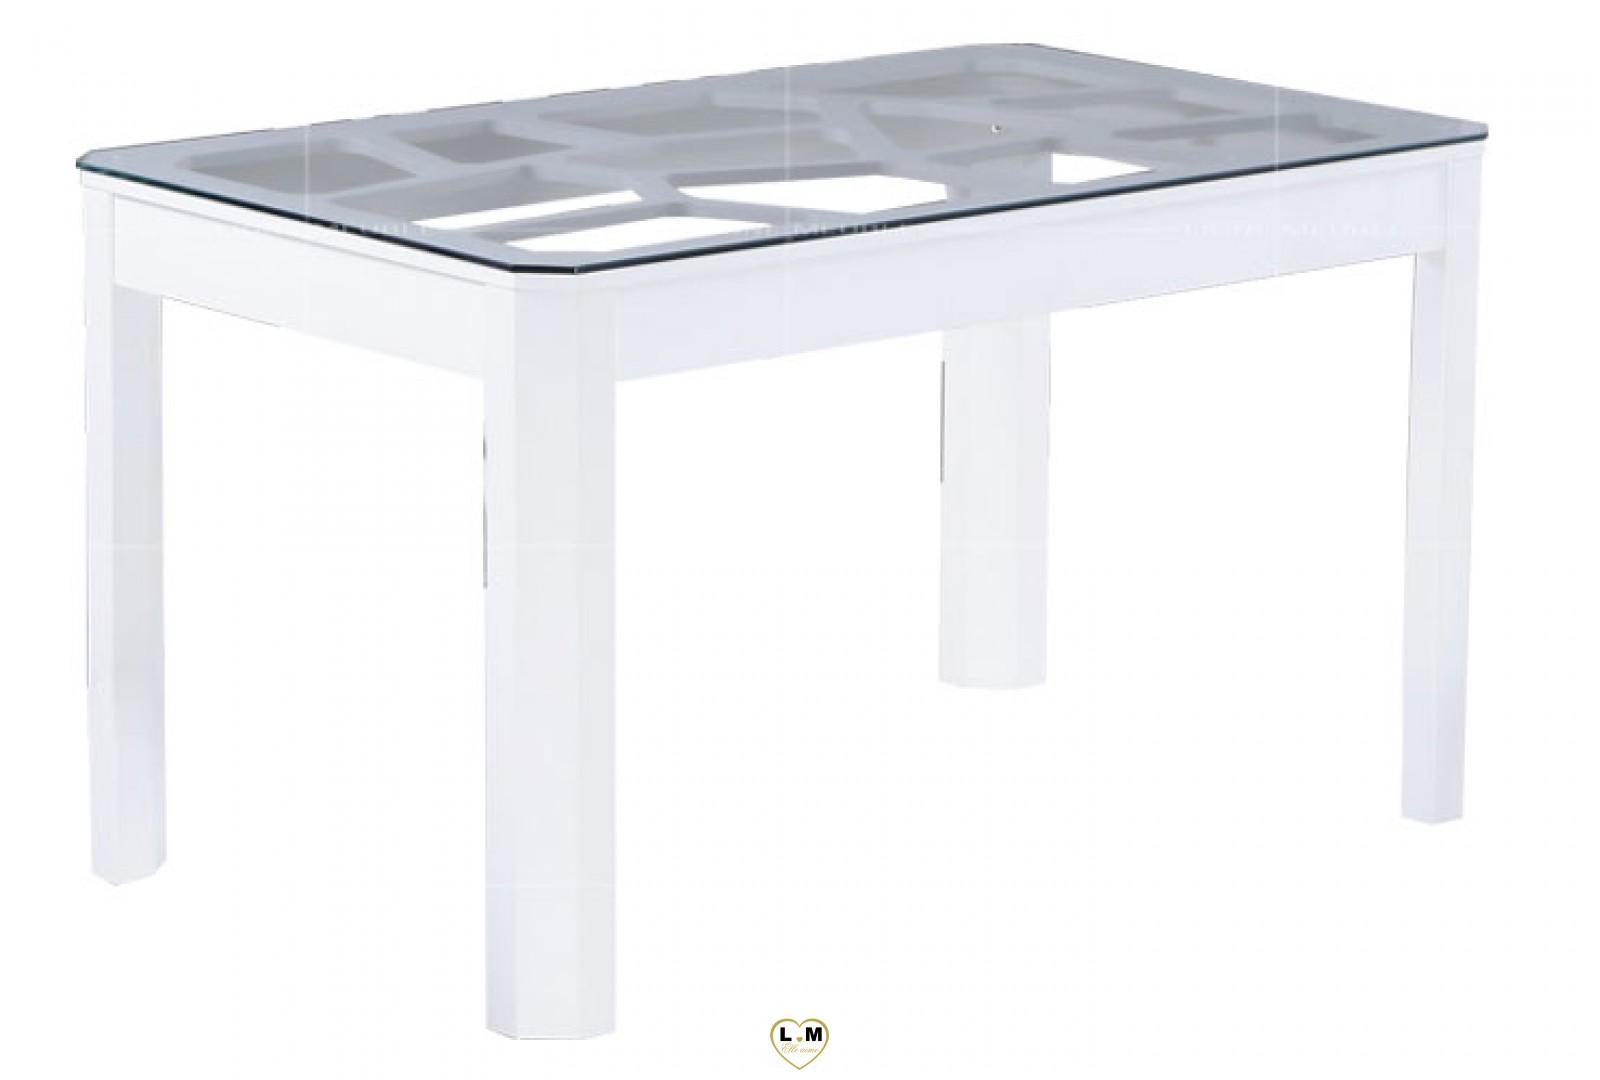 T110g table salle a manger laque blanc plateau verre for Table salle a manger plateau verre